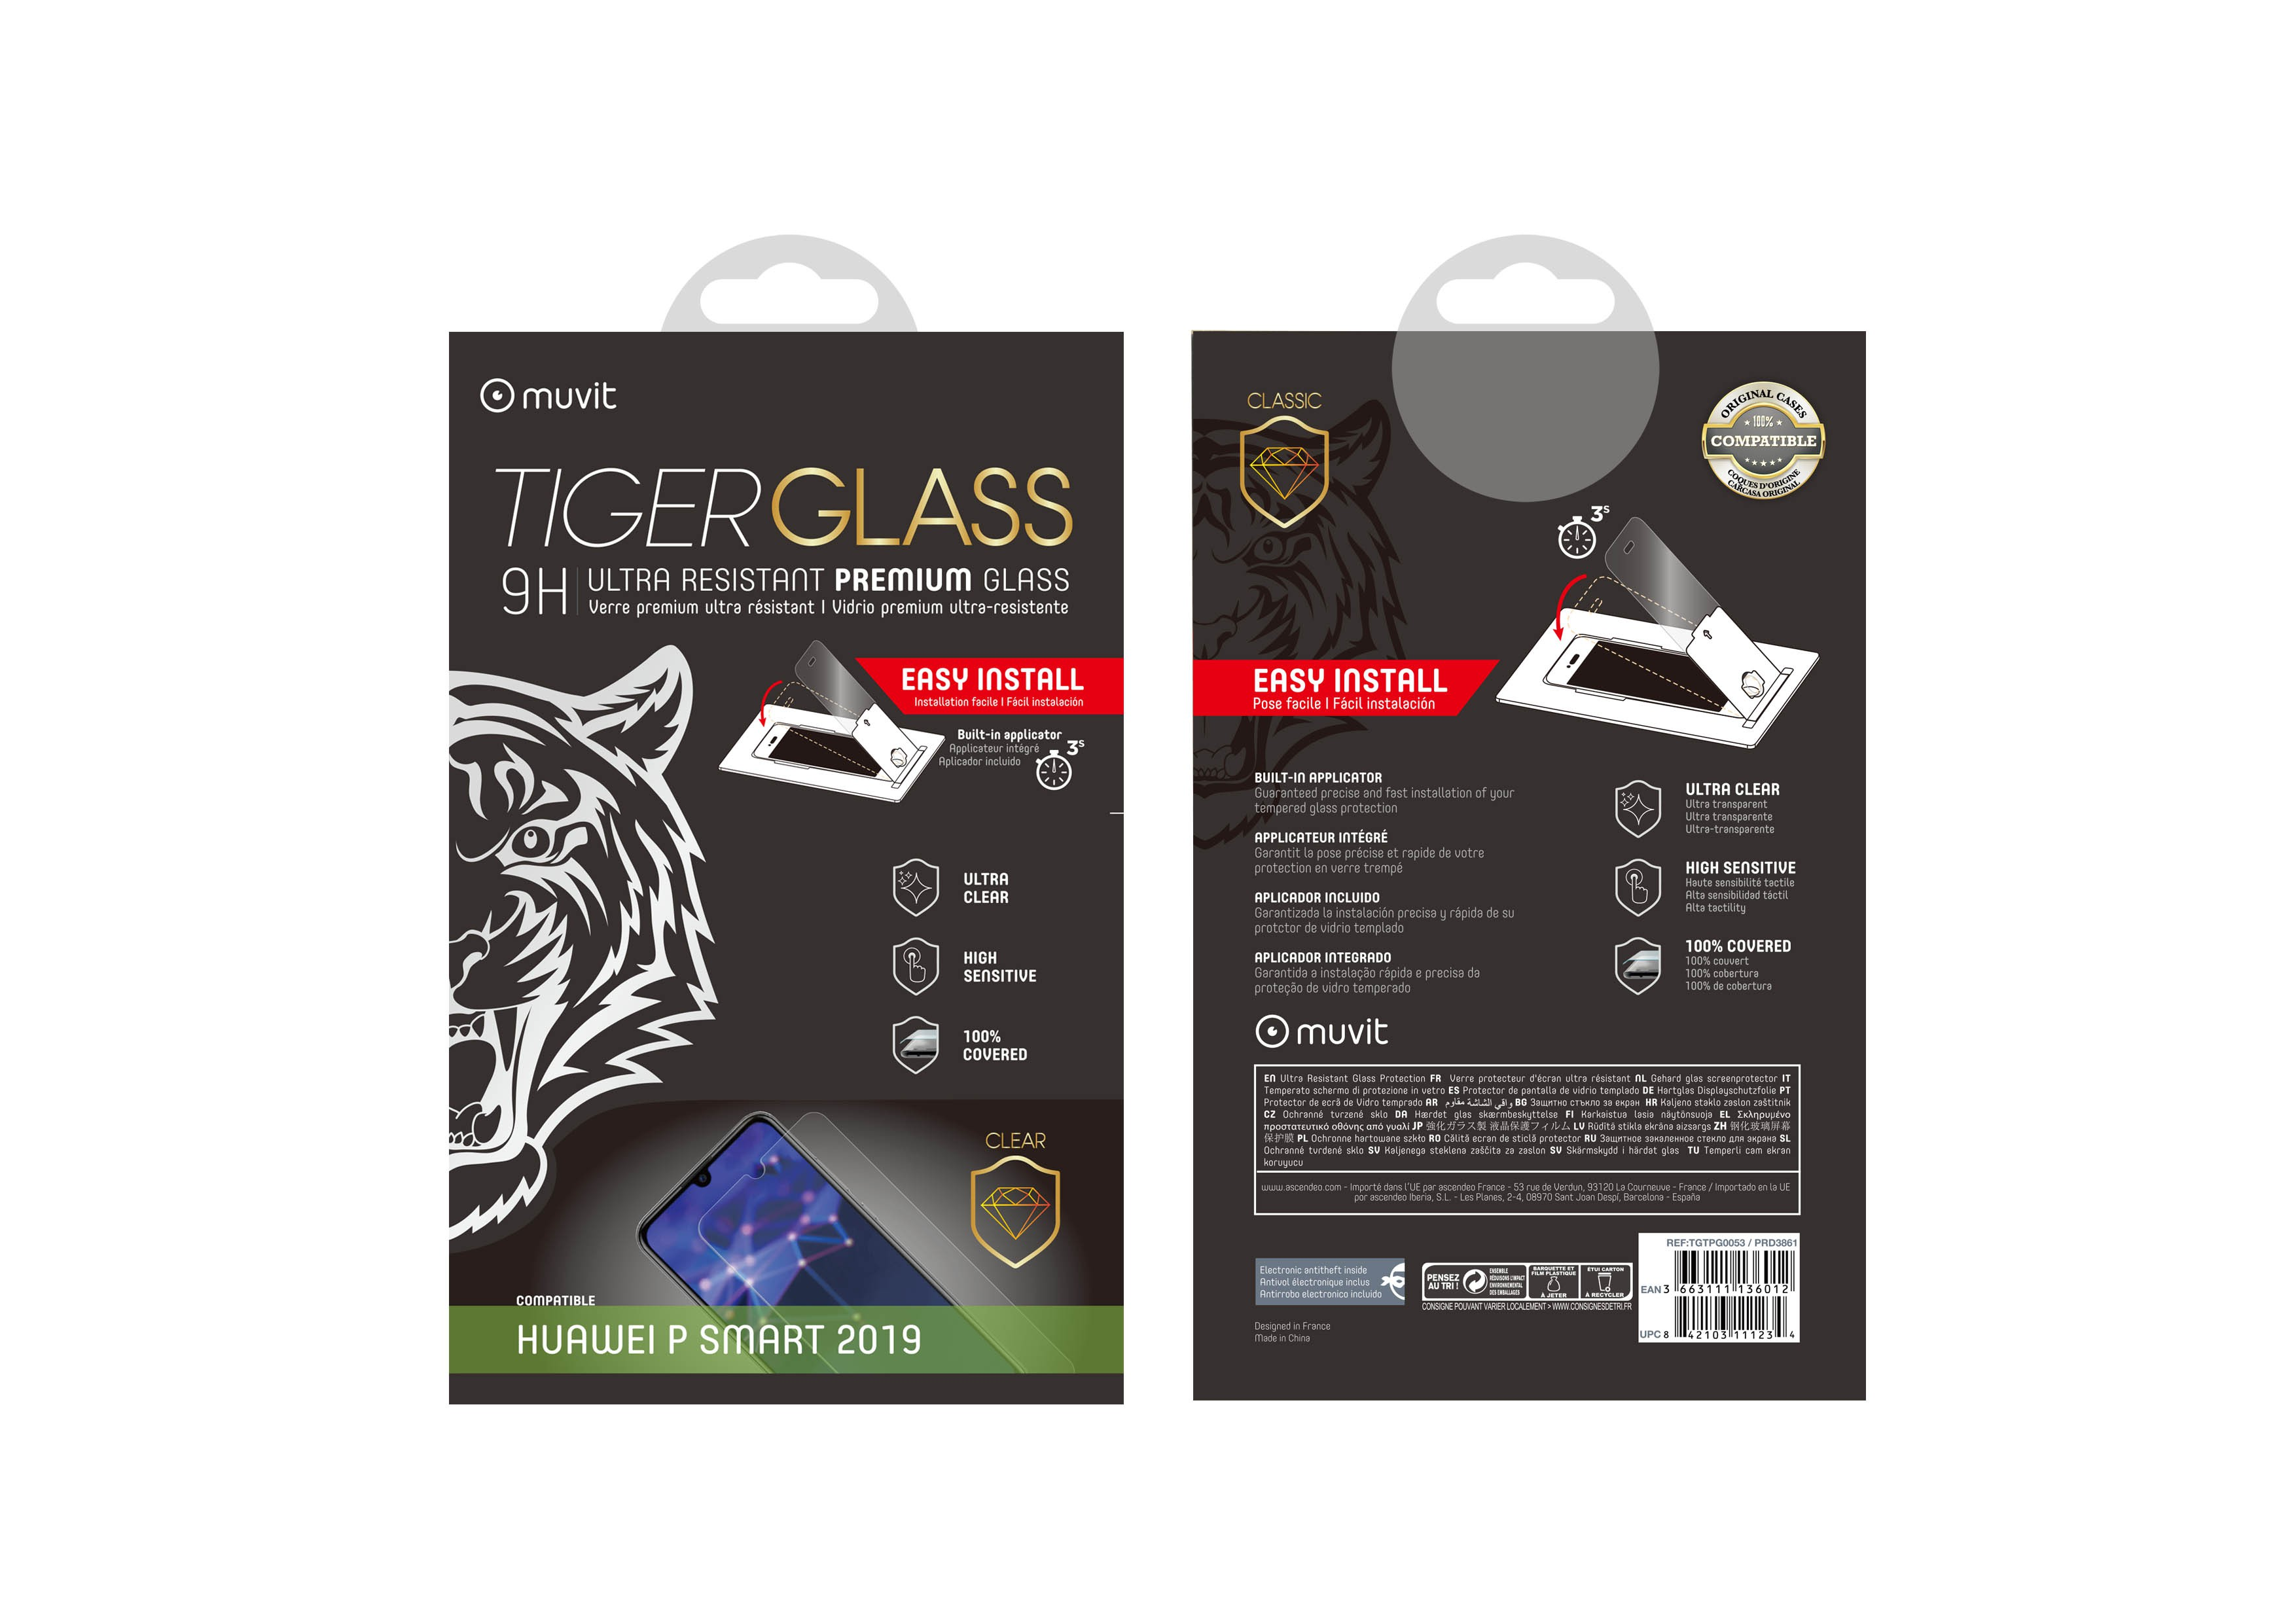 Film Tiger Glass Huawei P Smart 2019